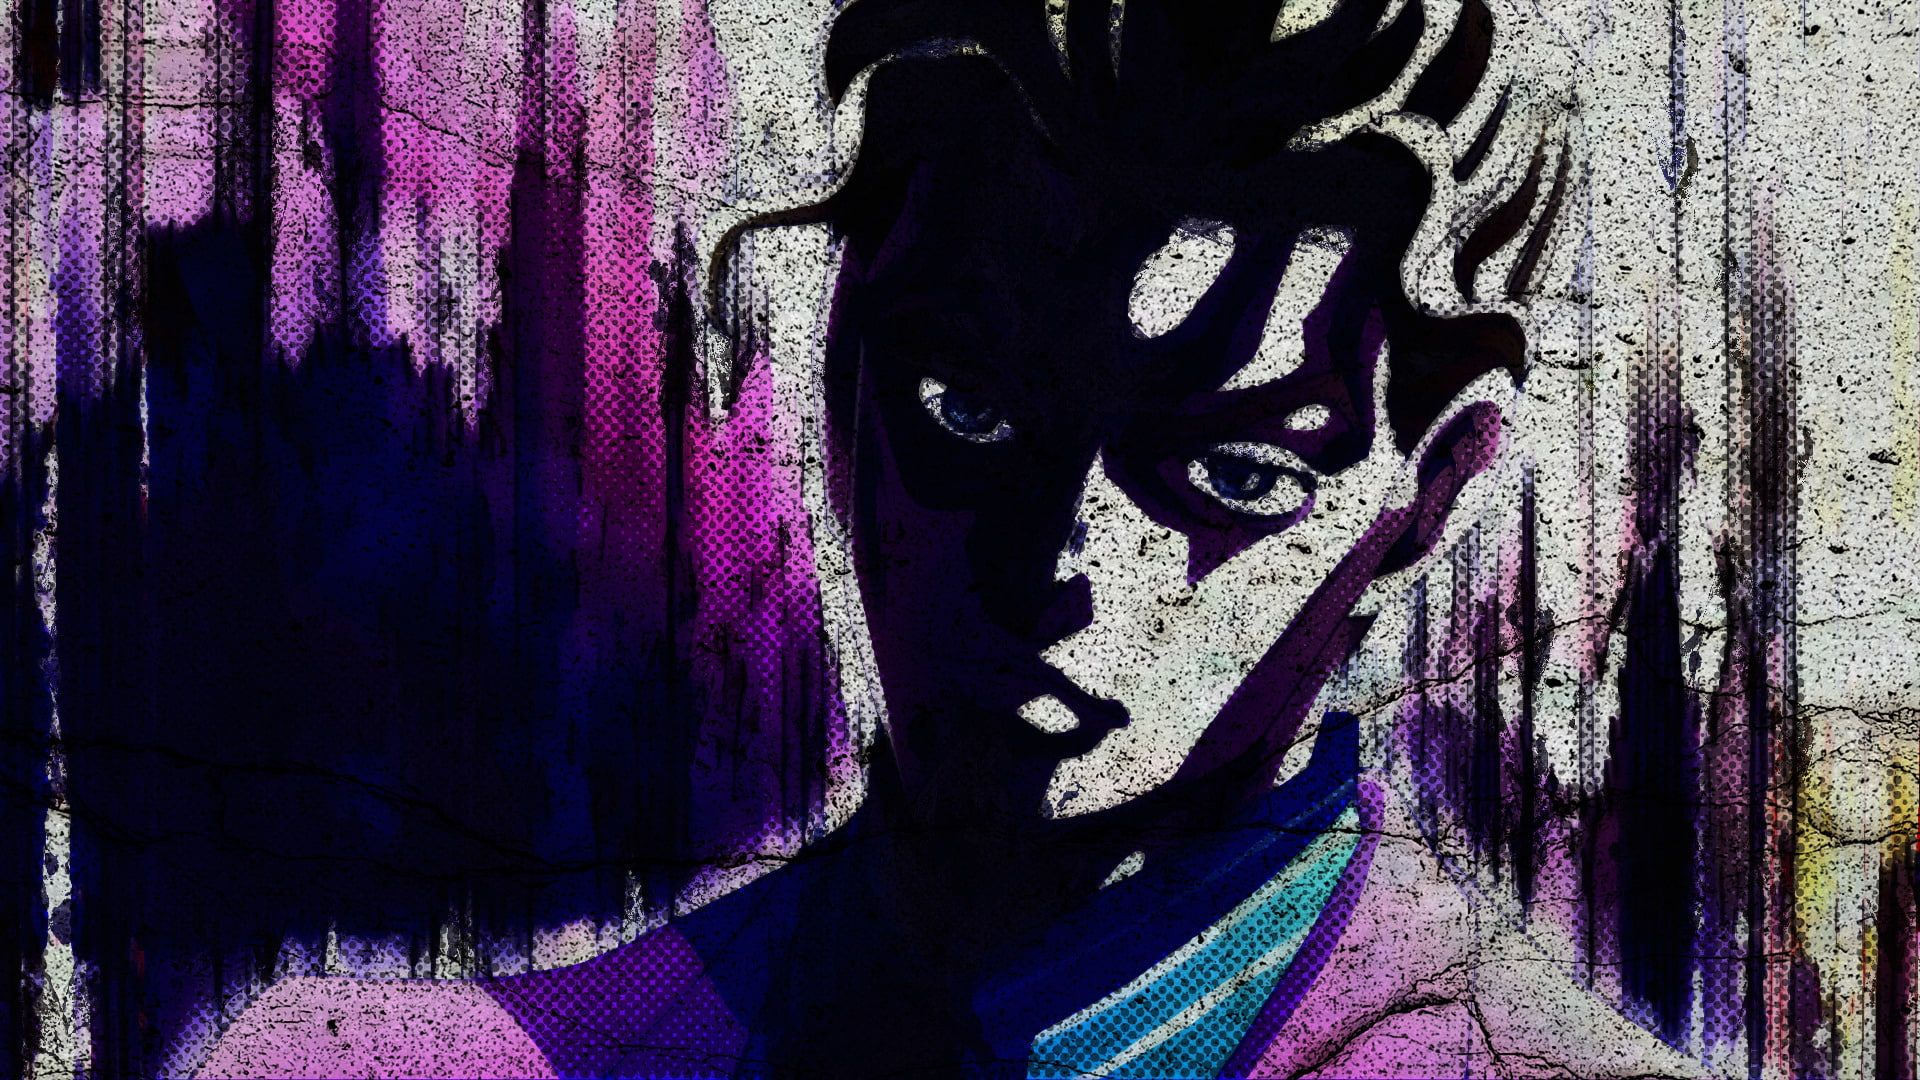 Anime Jojo S Bizarre Adventure Yoshikage Kira 1080p Wallpaper Hdwallpaper Desktop Jojo S Bizarre Adventure Yoshikage Kira Jojo Bizarre